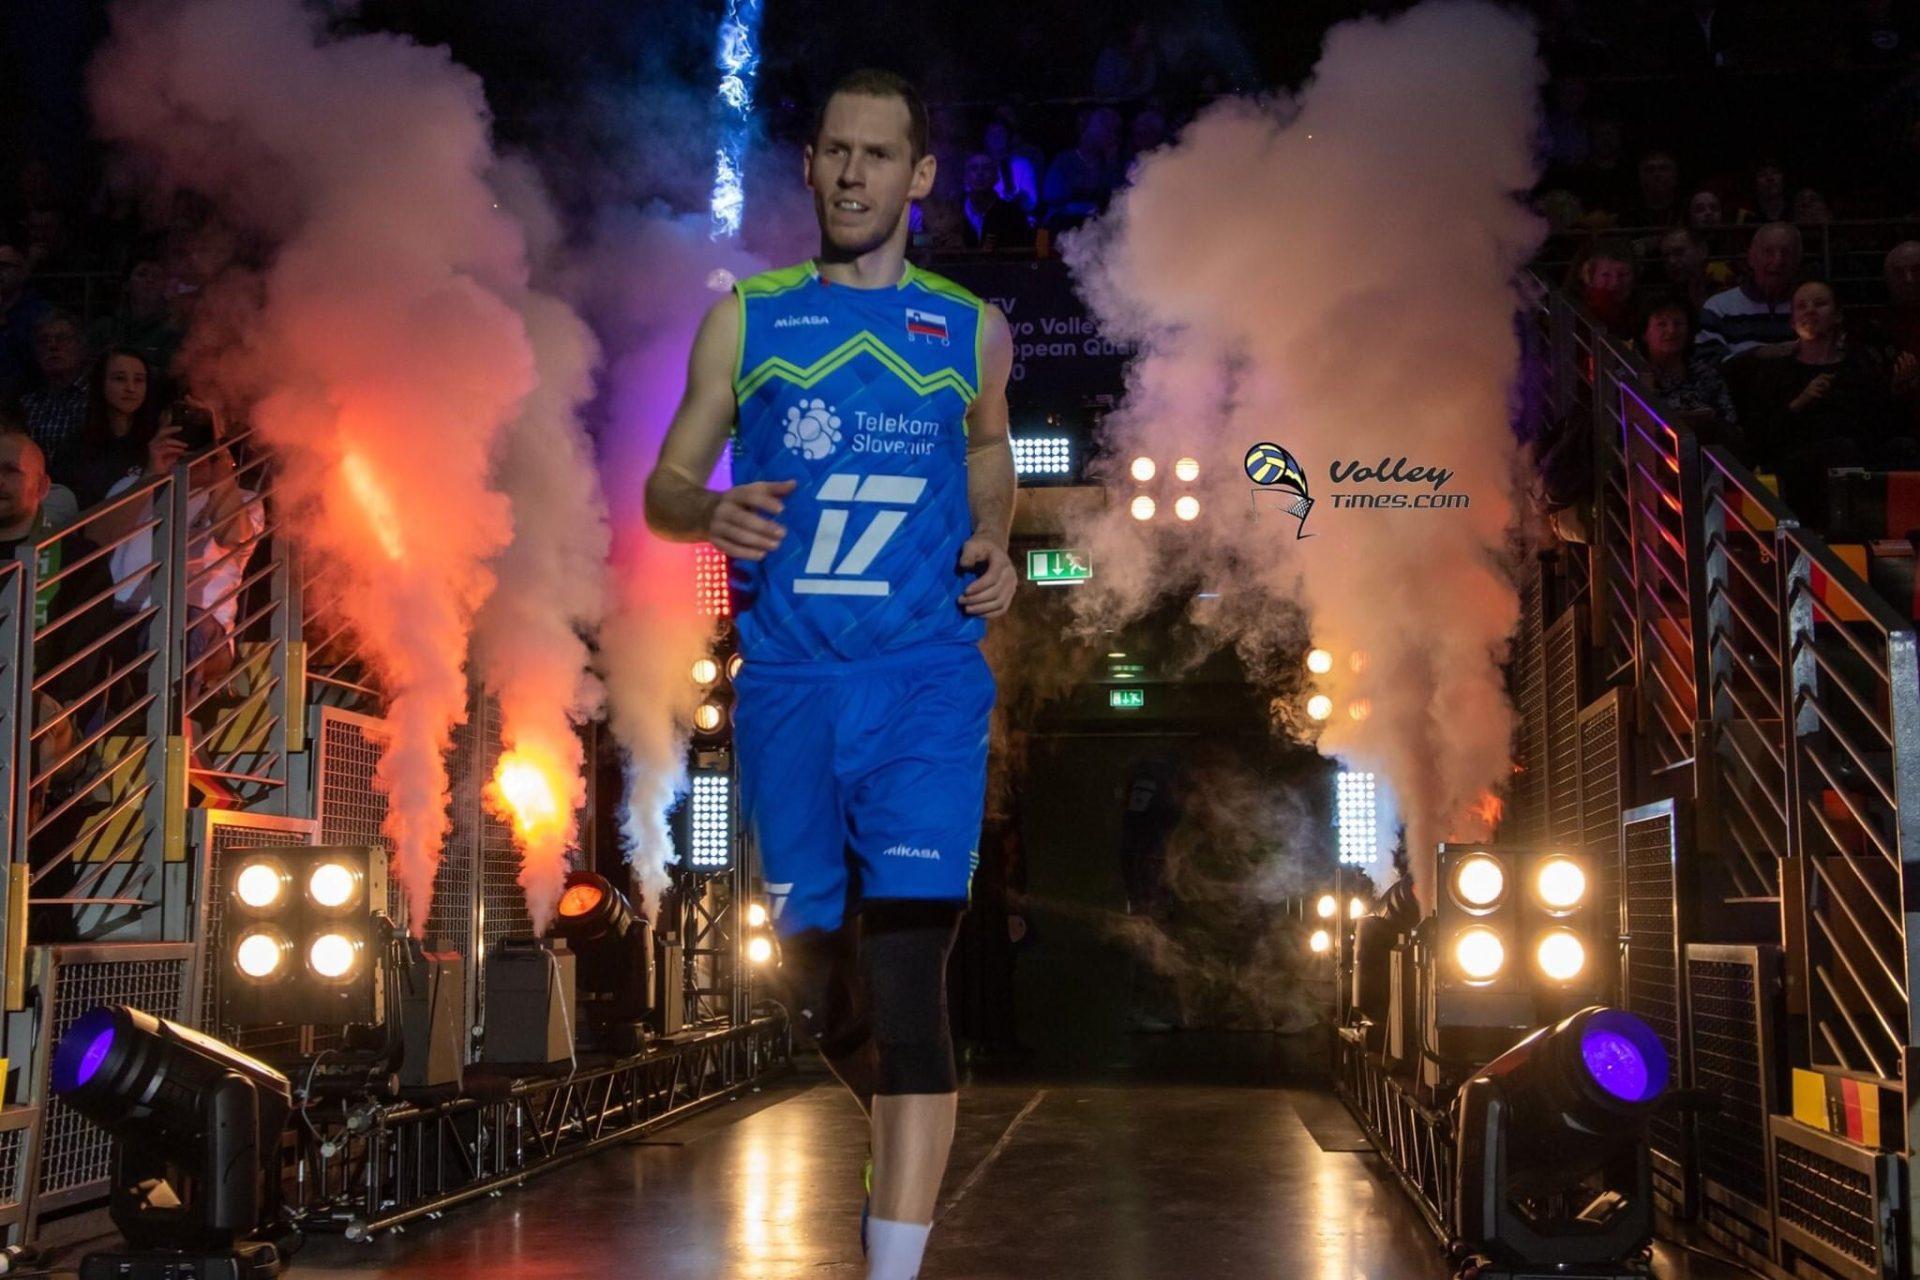 Urnaut retires from Slovenia National Team